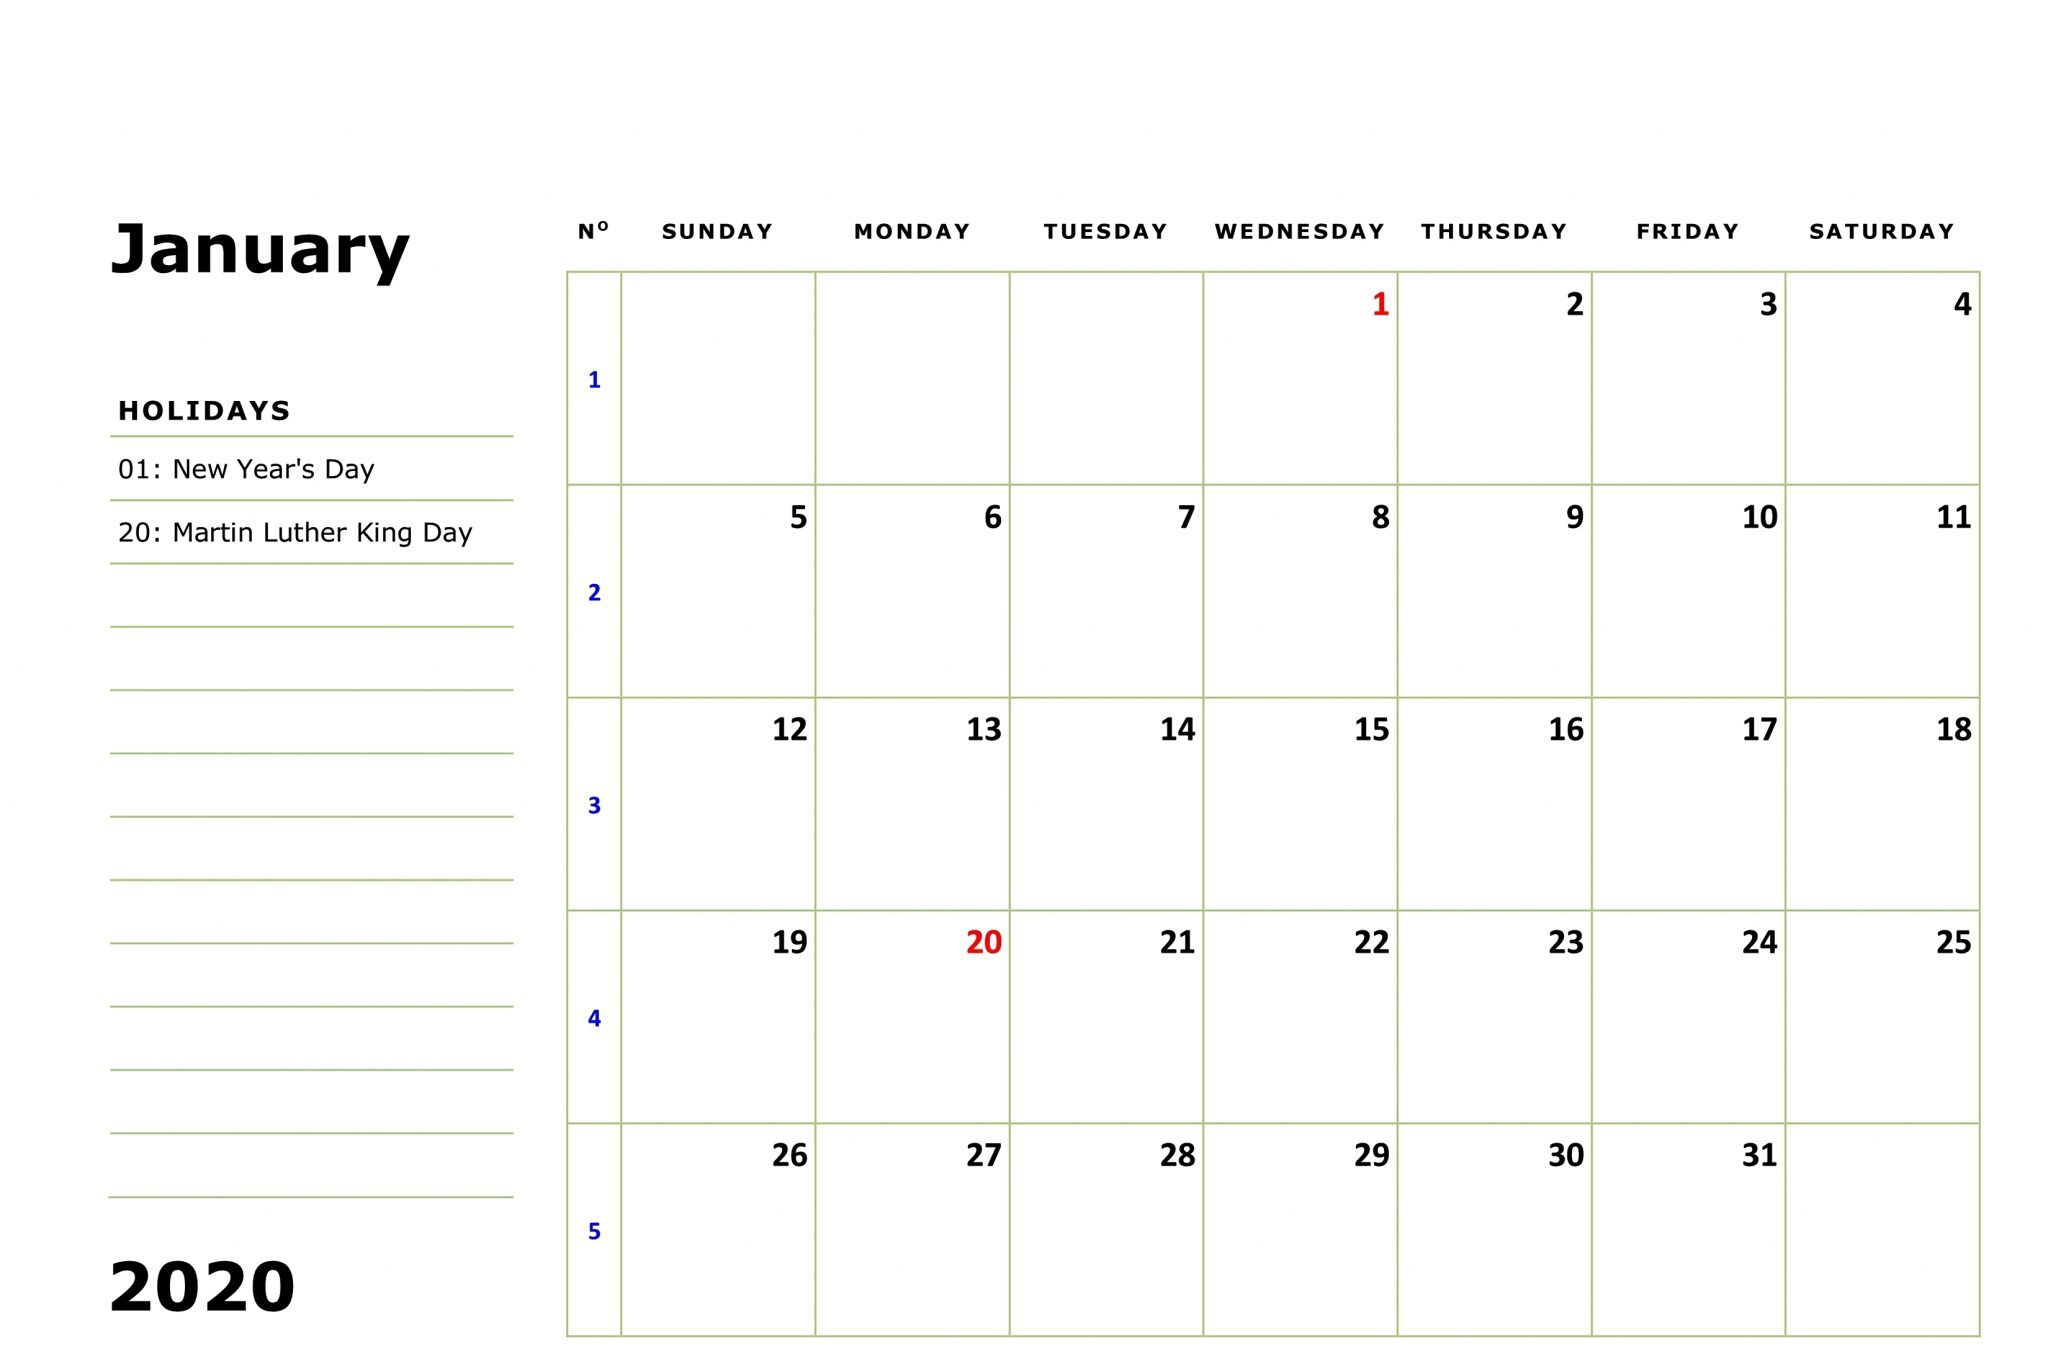 January 2020 Calendar Holidays Holiday Calendar Printable